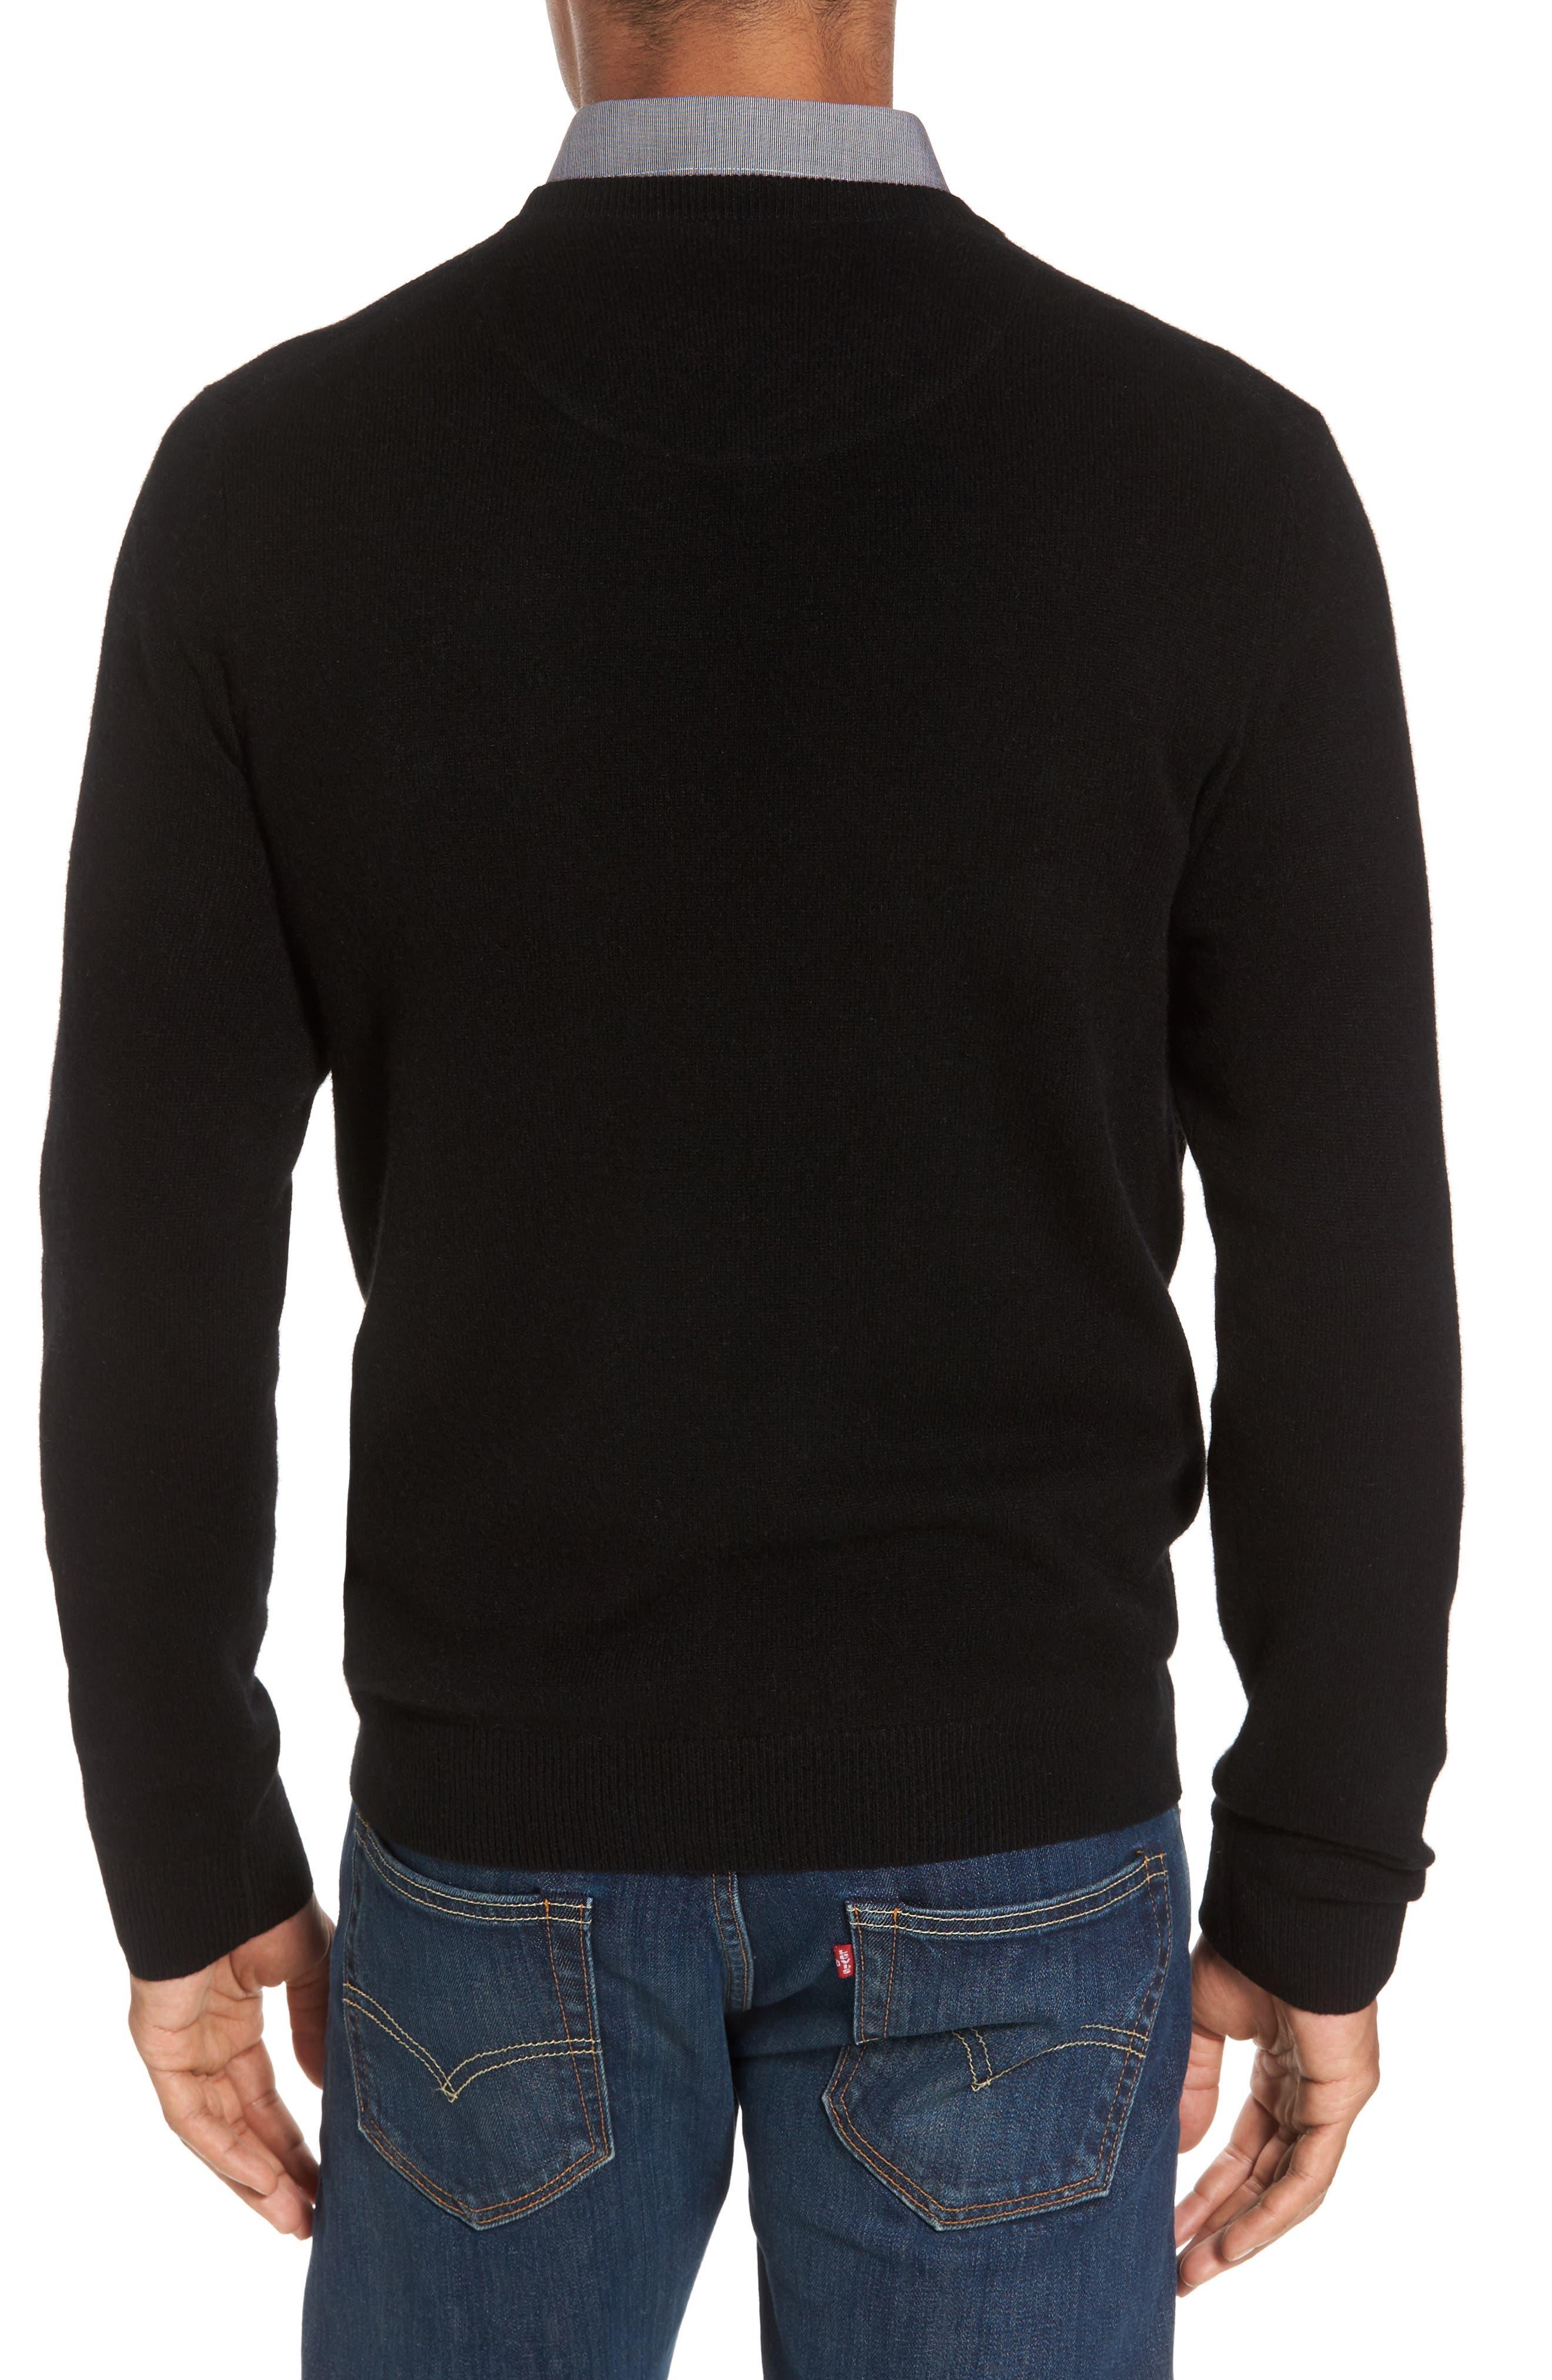 NORDSTROM MEN'S SHOP,                             Cashmere V-Neck Sweater,                             Alternate thumbnail 2, color,                             BLACK CAVIAR